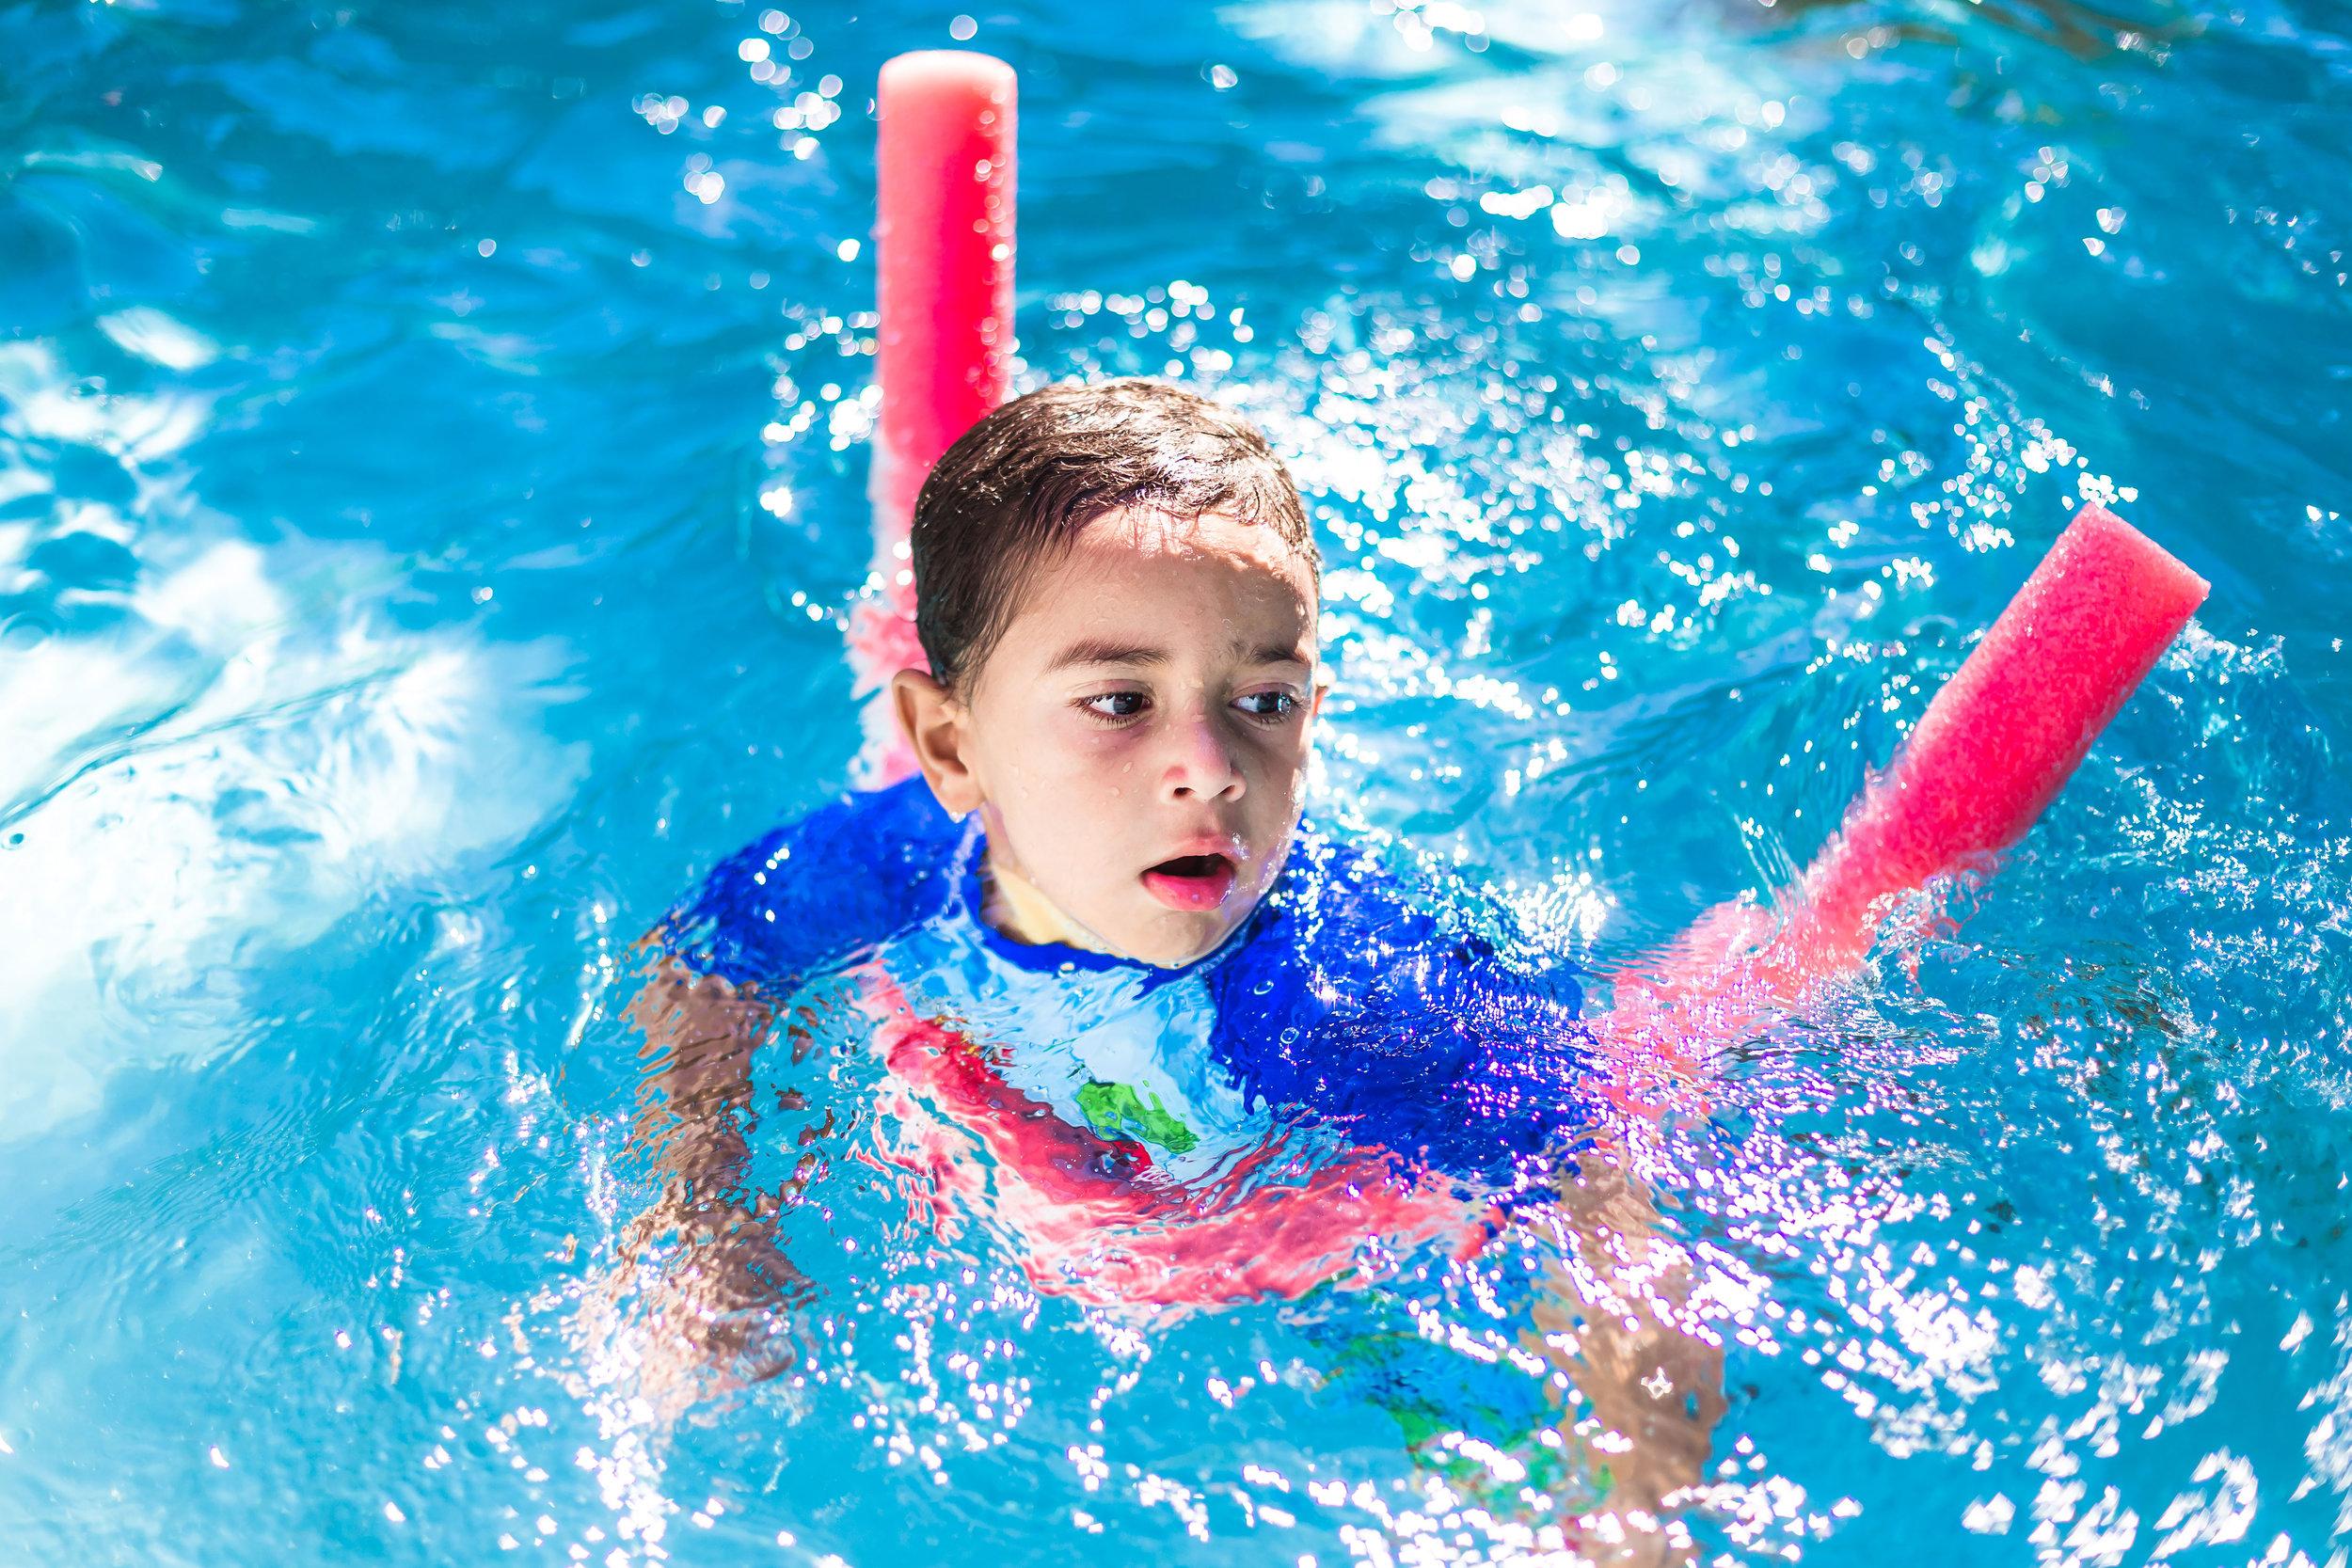 Ipswich YMCA Children's Birthday Photographer   Stephen Grant Photography